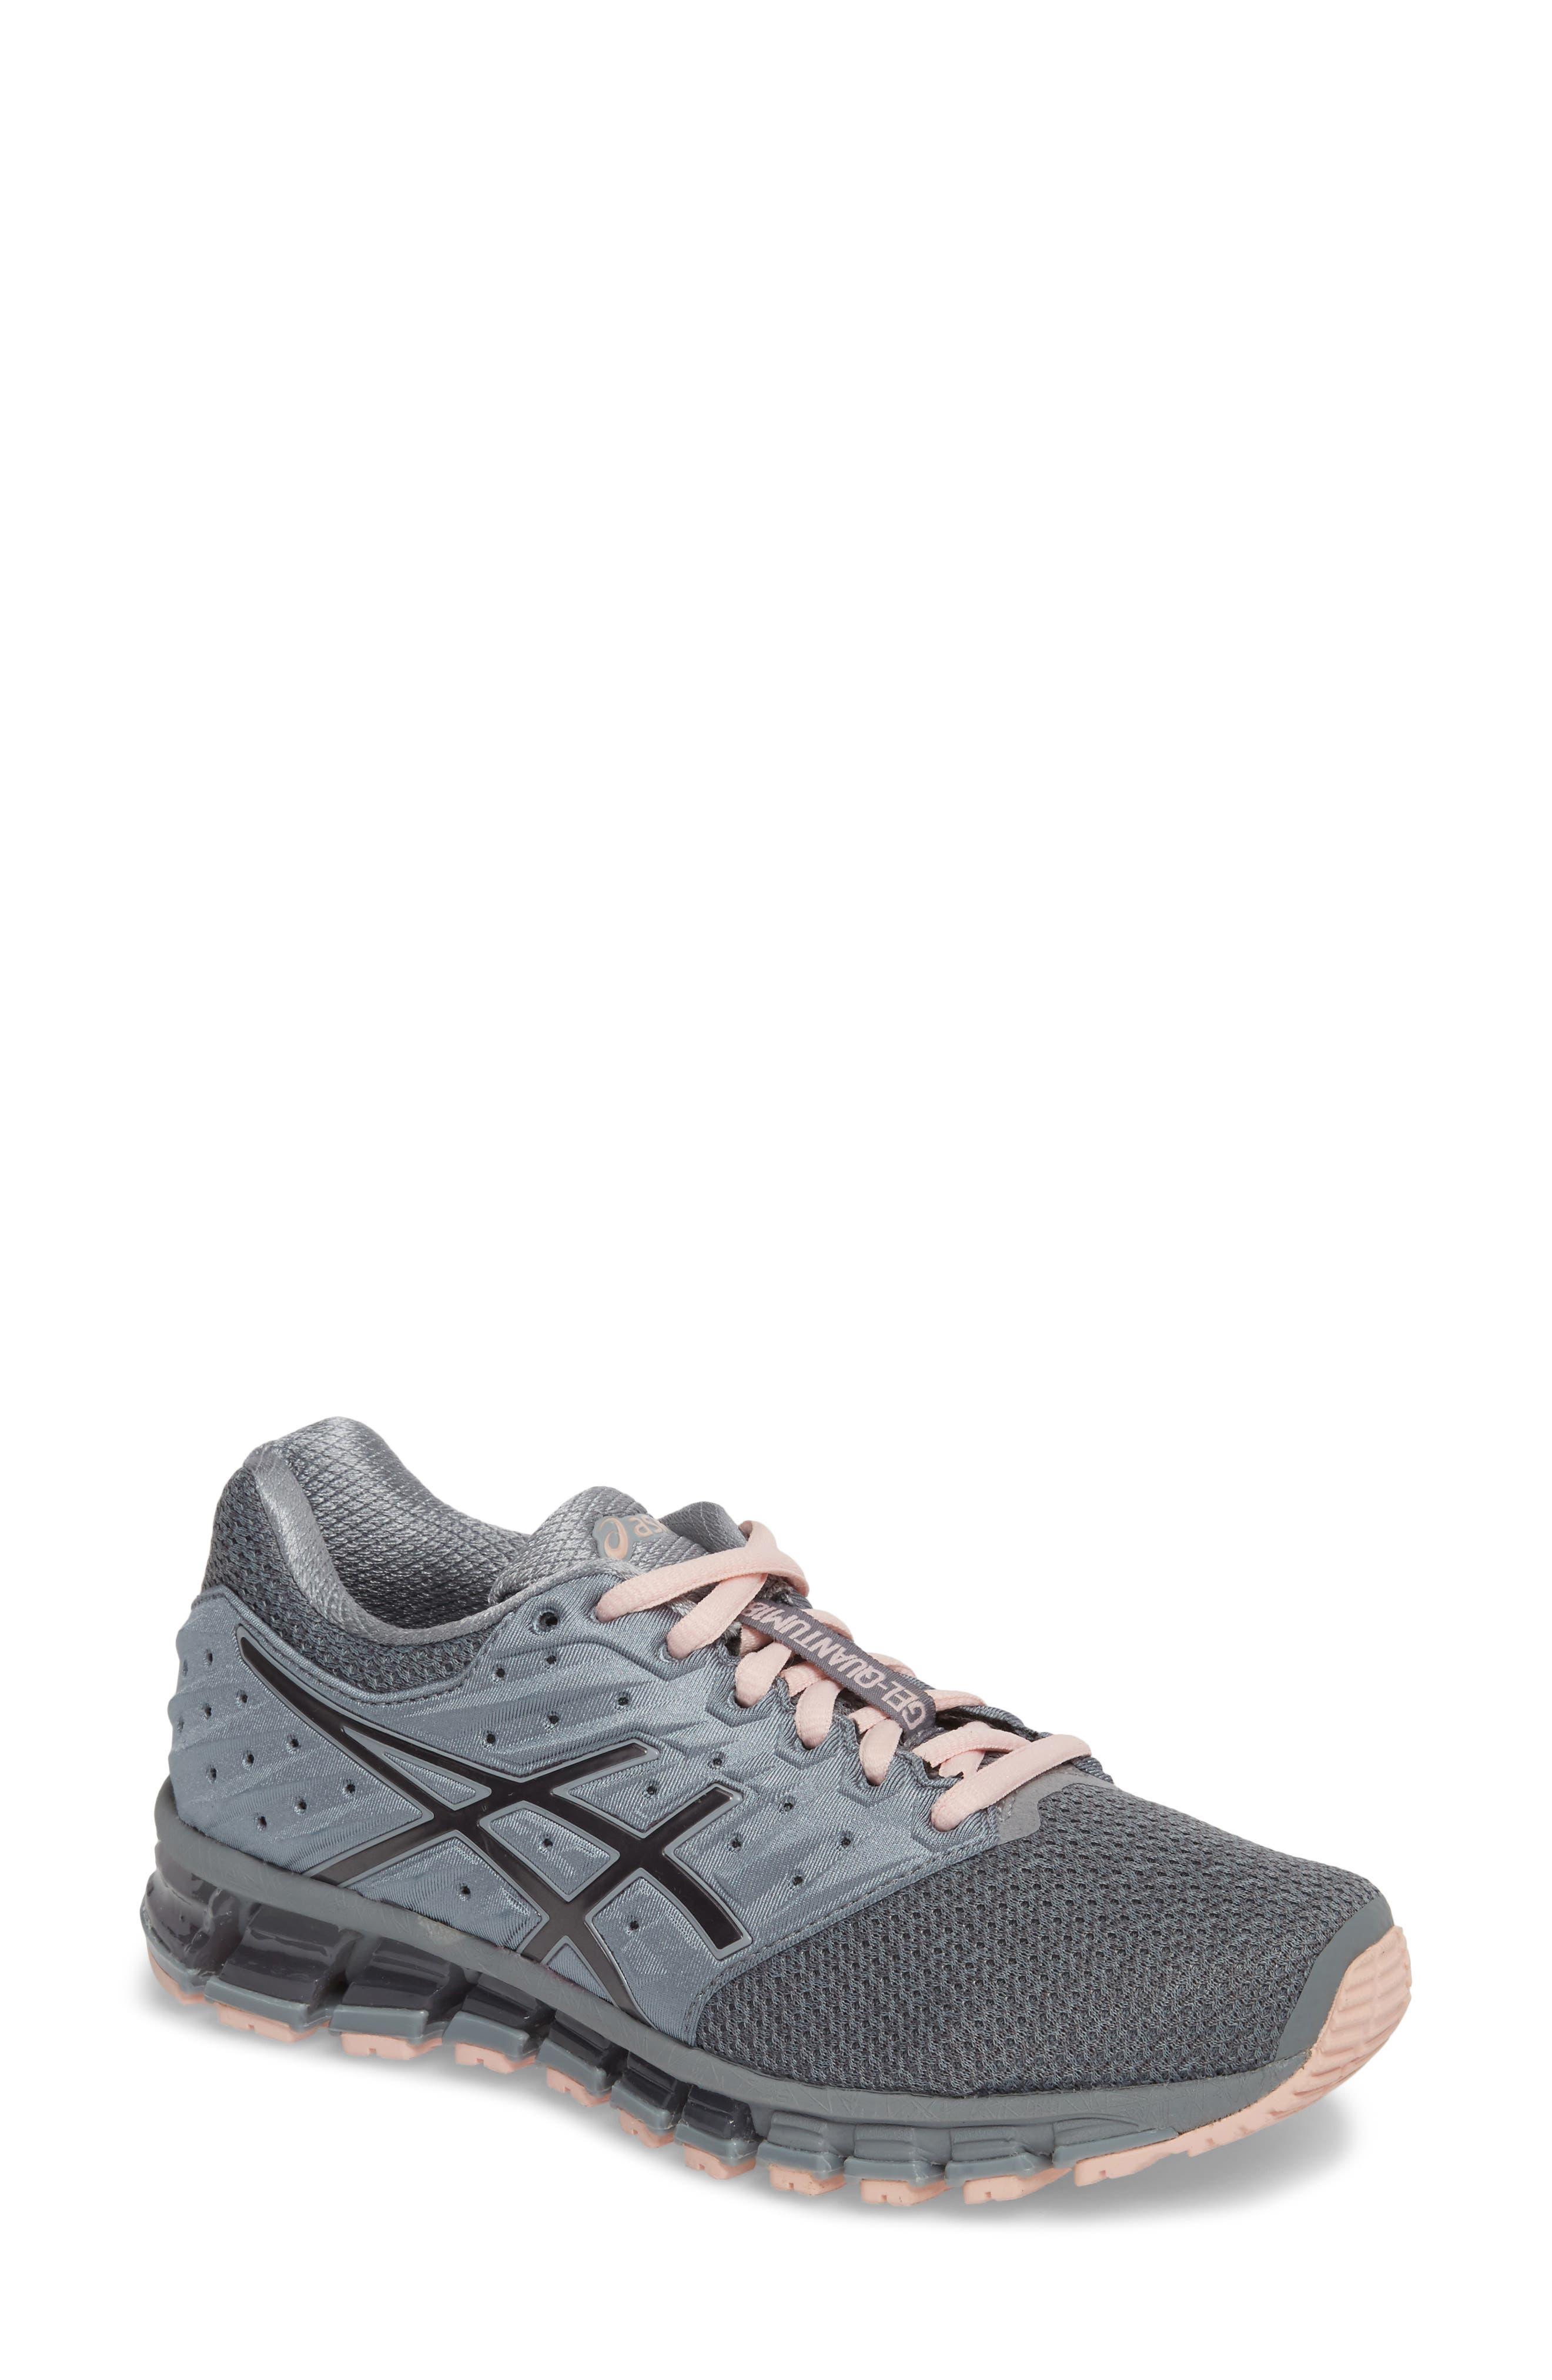 'GEL-Quantum 180 2' Running Shoe,                         Main,                         color, Stone Grey/ Carbon/ Pink